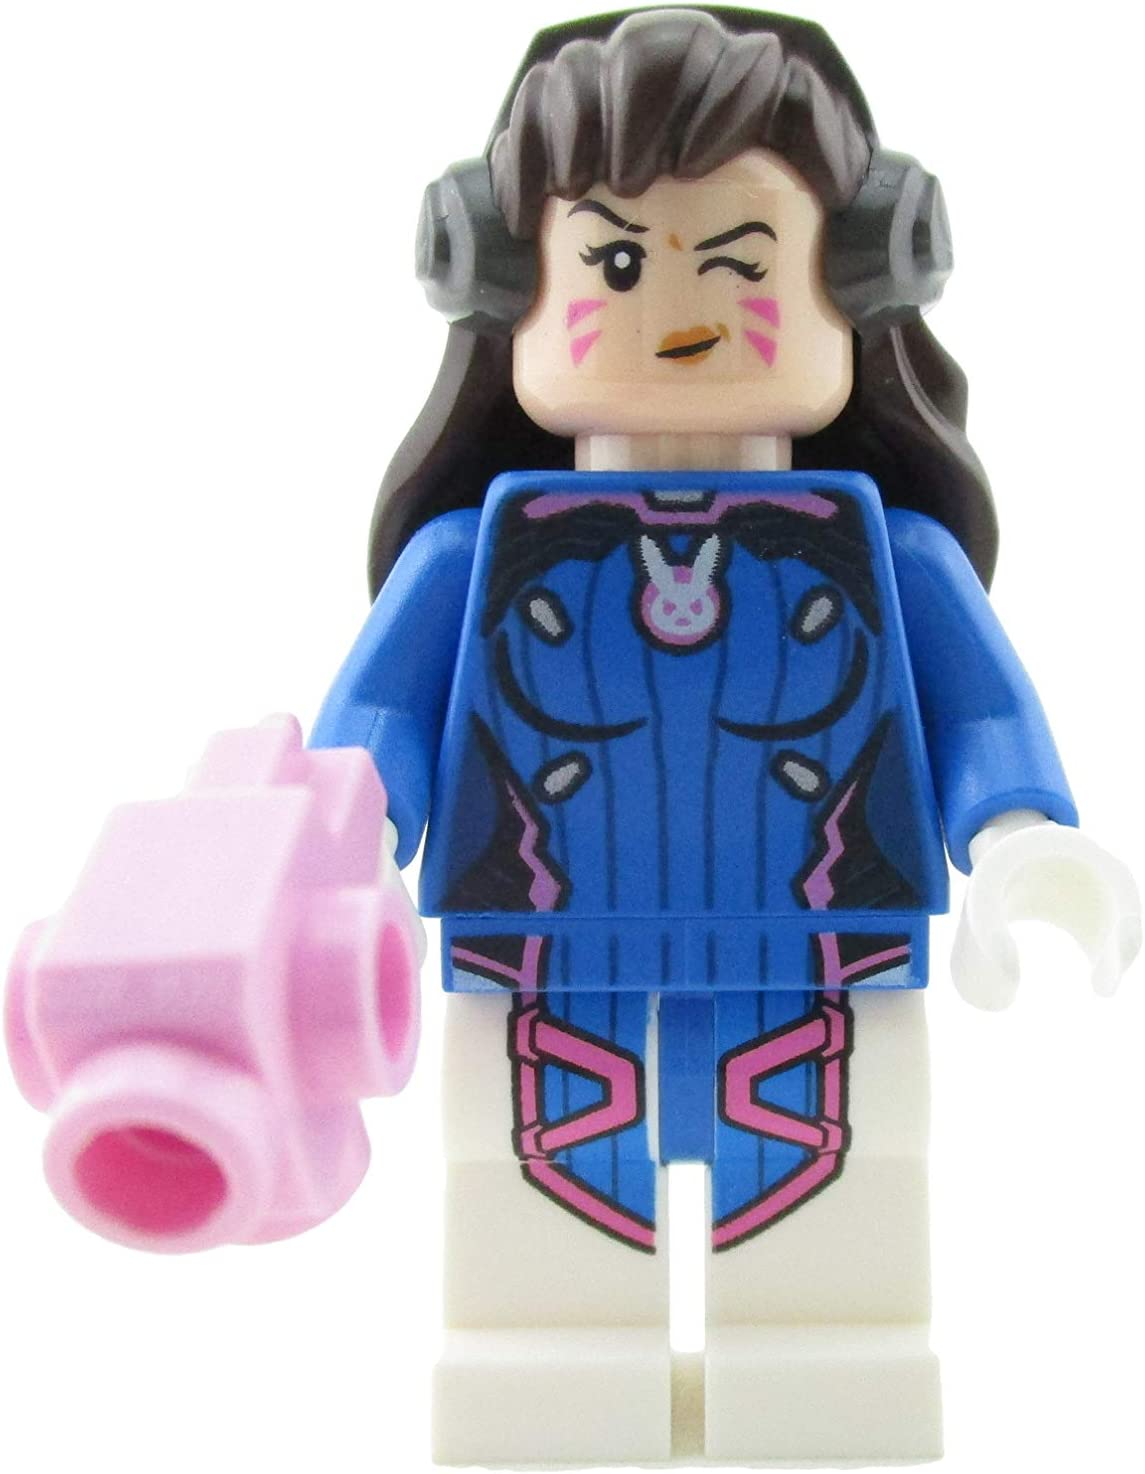 LEGO Overwatch D. Va Minifigure 75973 Mini Fig D.Va